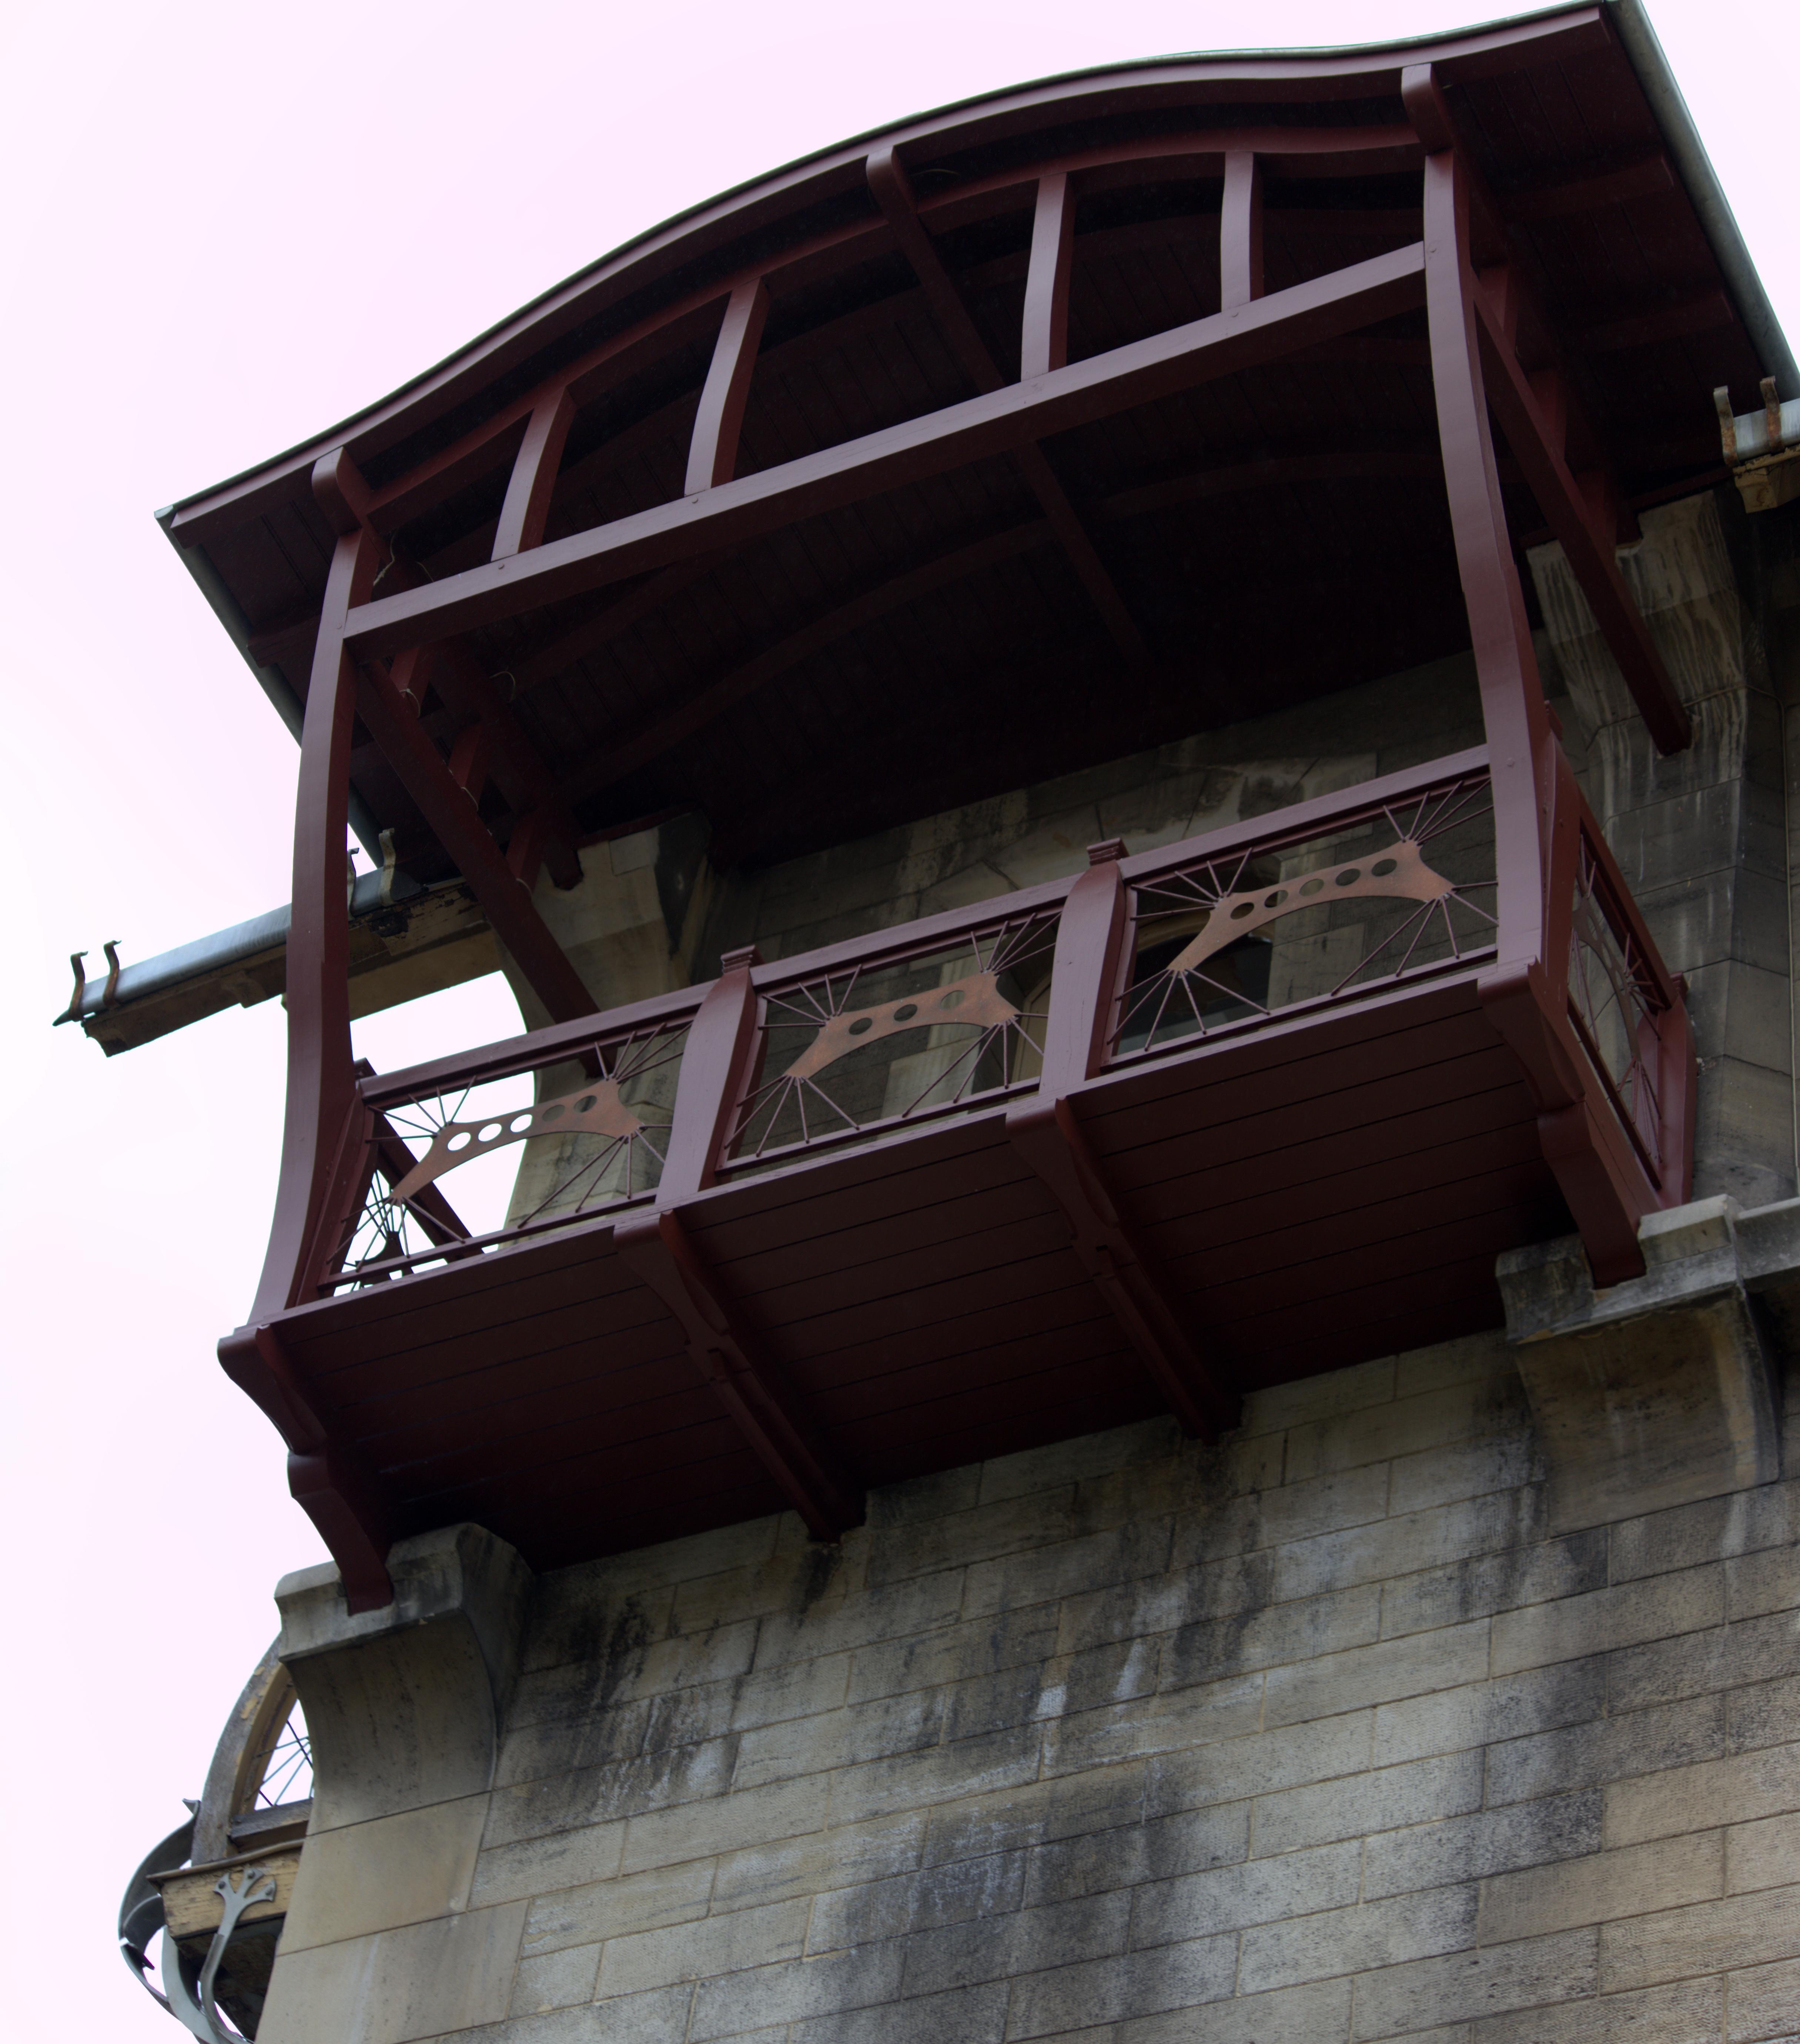 File balcon wikimedia commons for Balcon in english